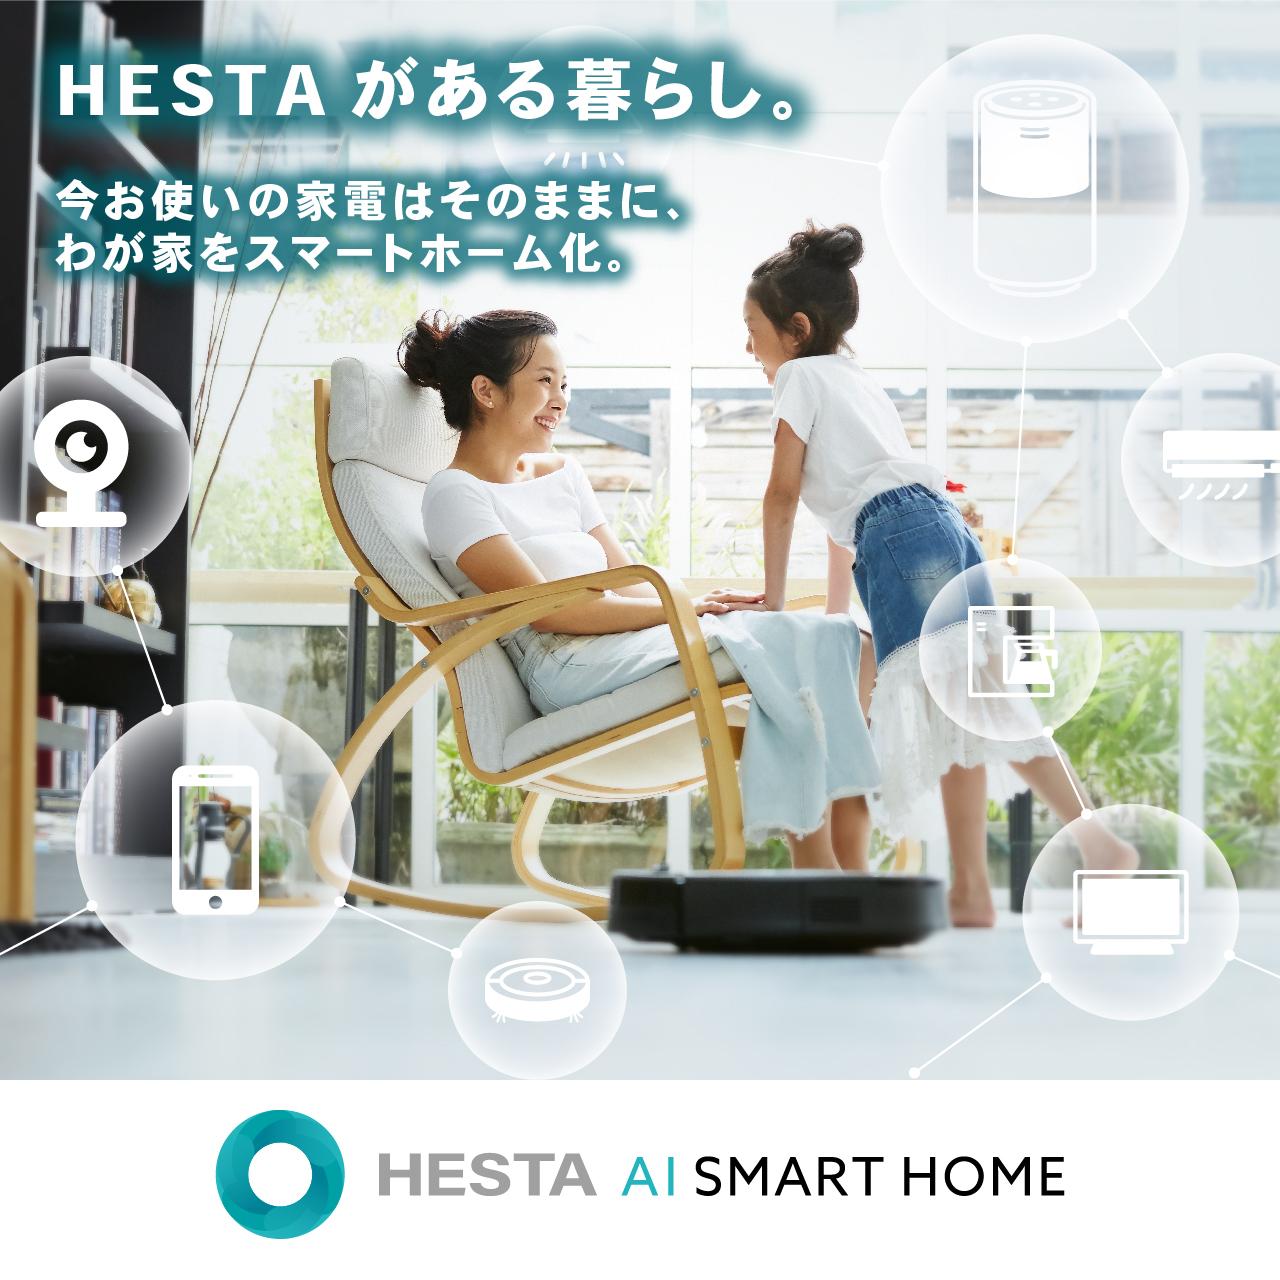 HESTA AI SMART HOME